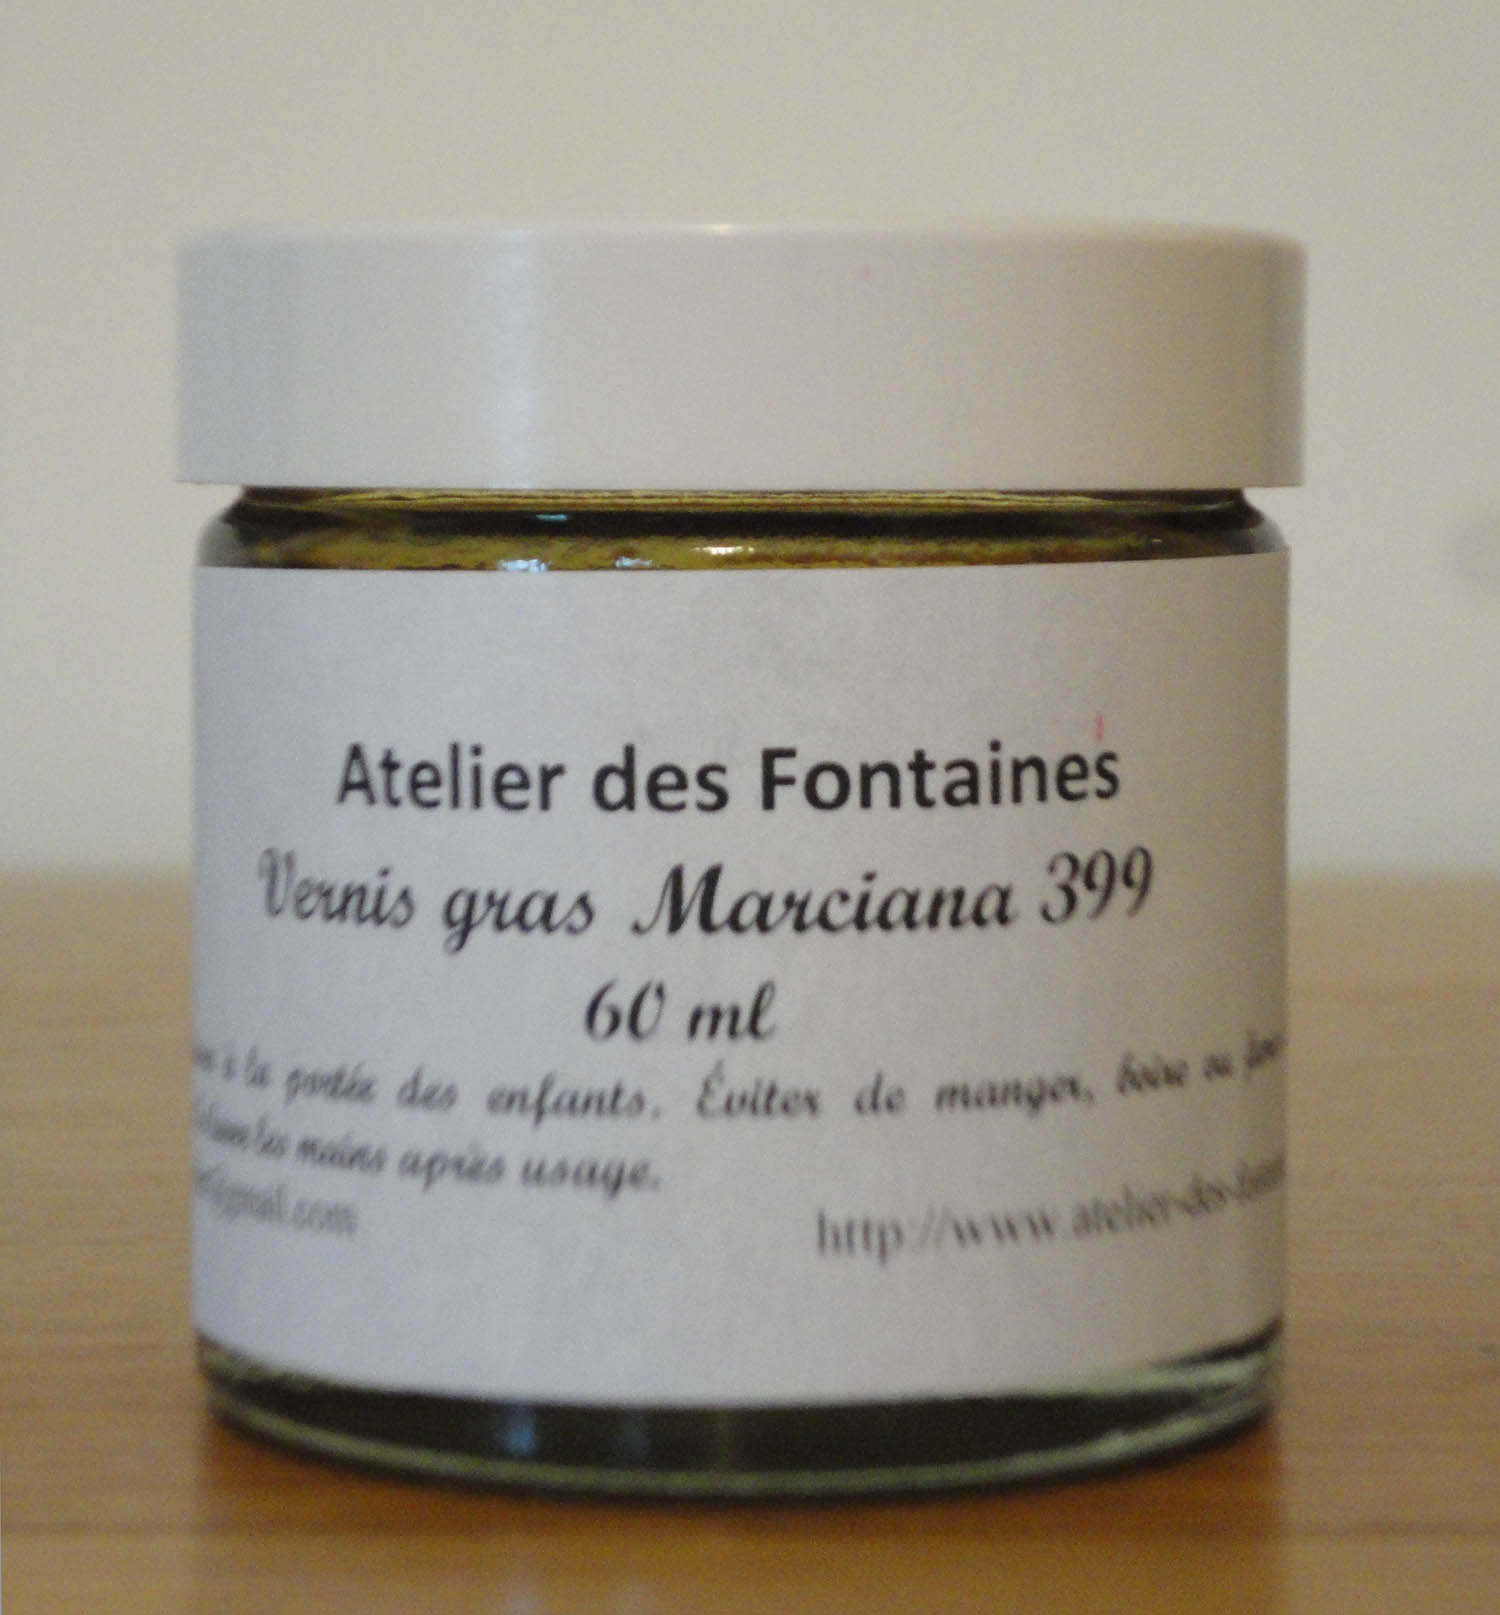 vernis-gras-marciana-399-atelier-fontaines-6.jpg